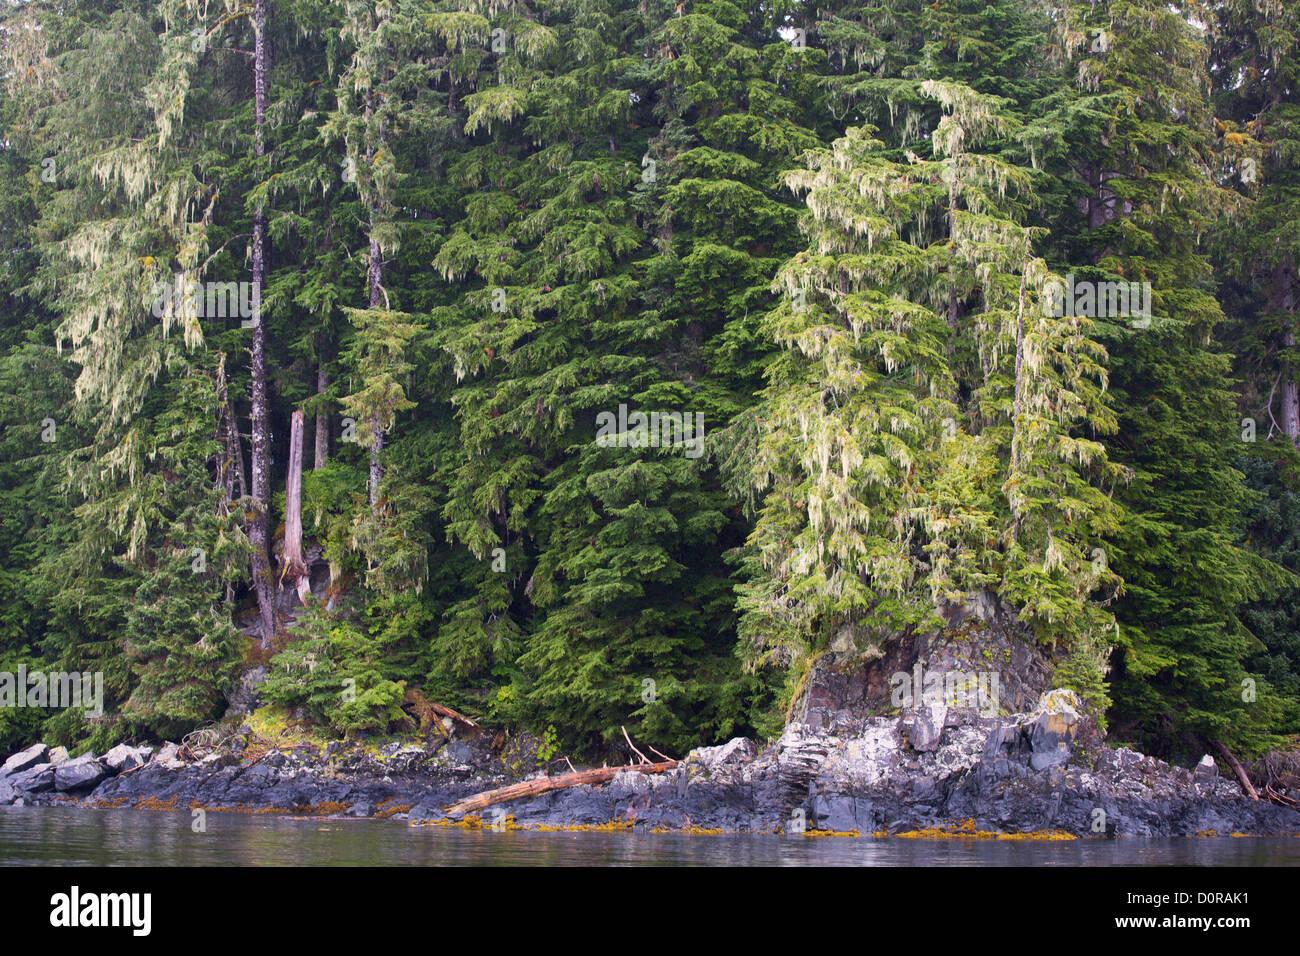 Tongass National Forest, Alaska. - Stock Image